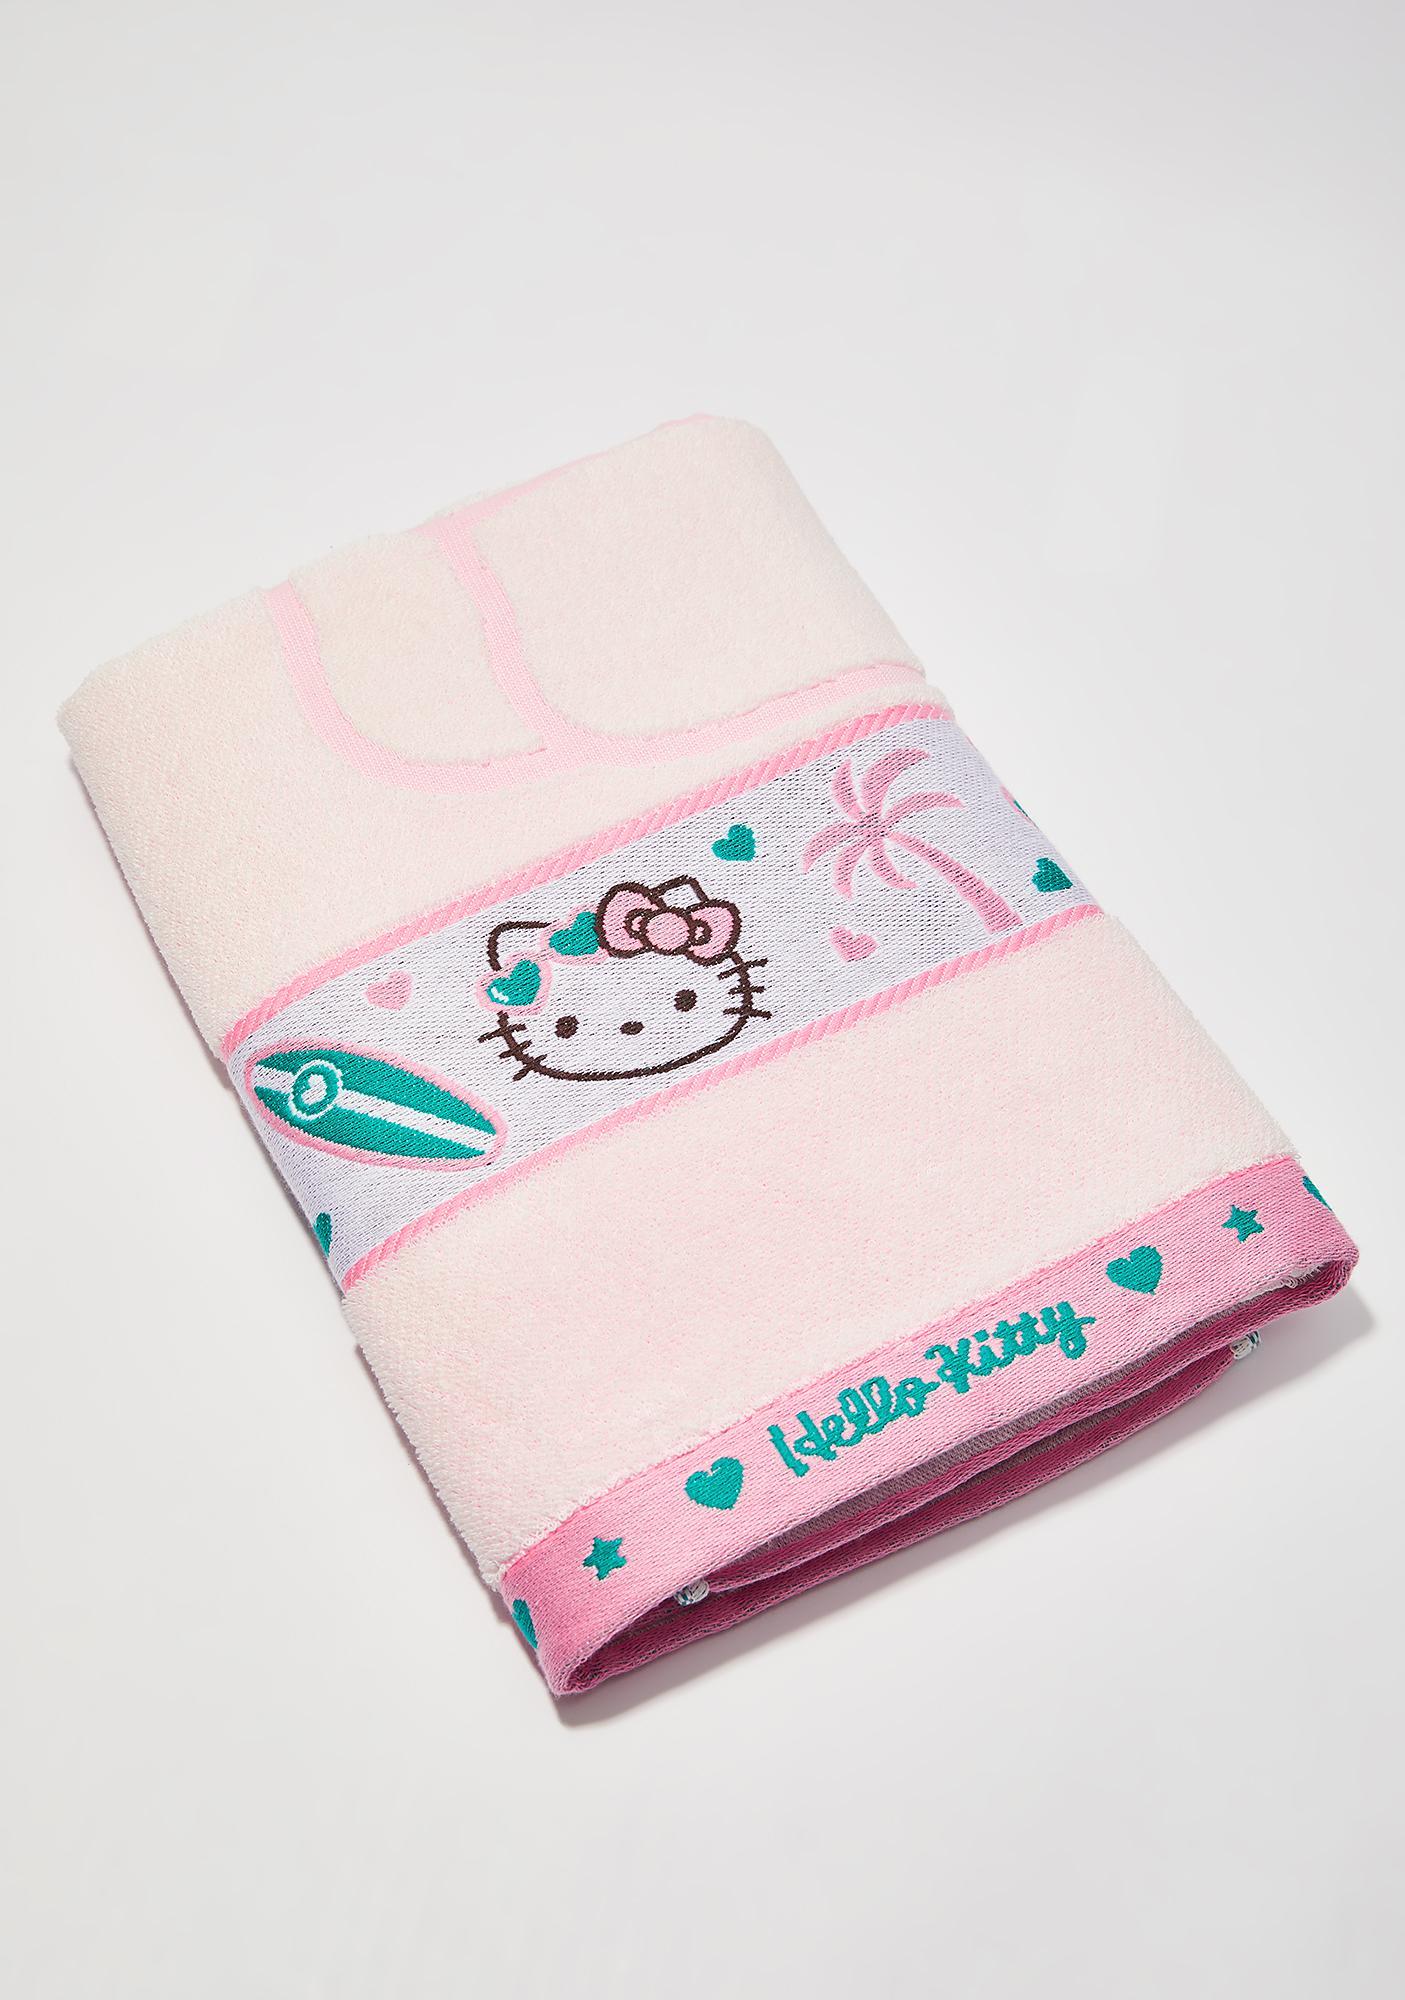 Sanrio Pink Beach Towel